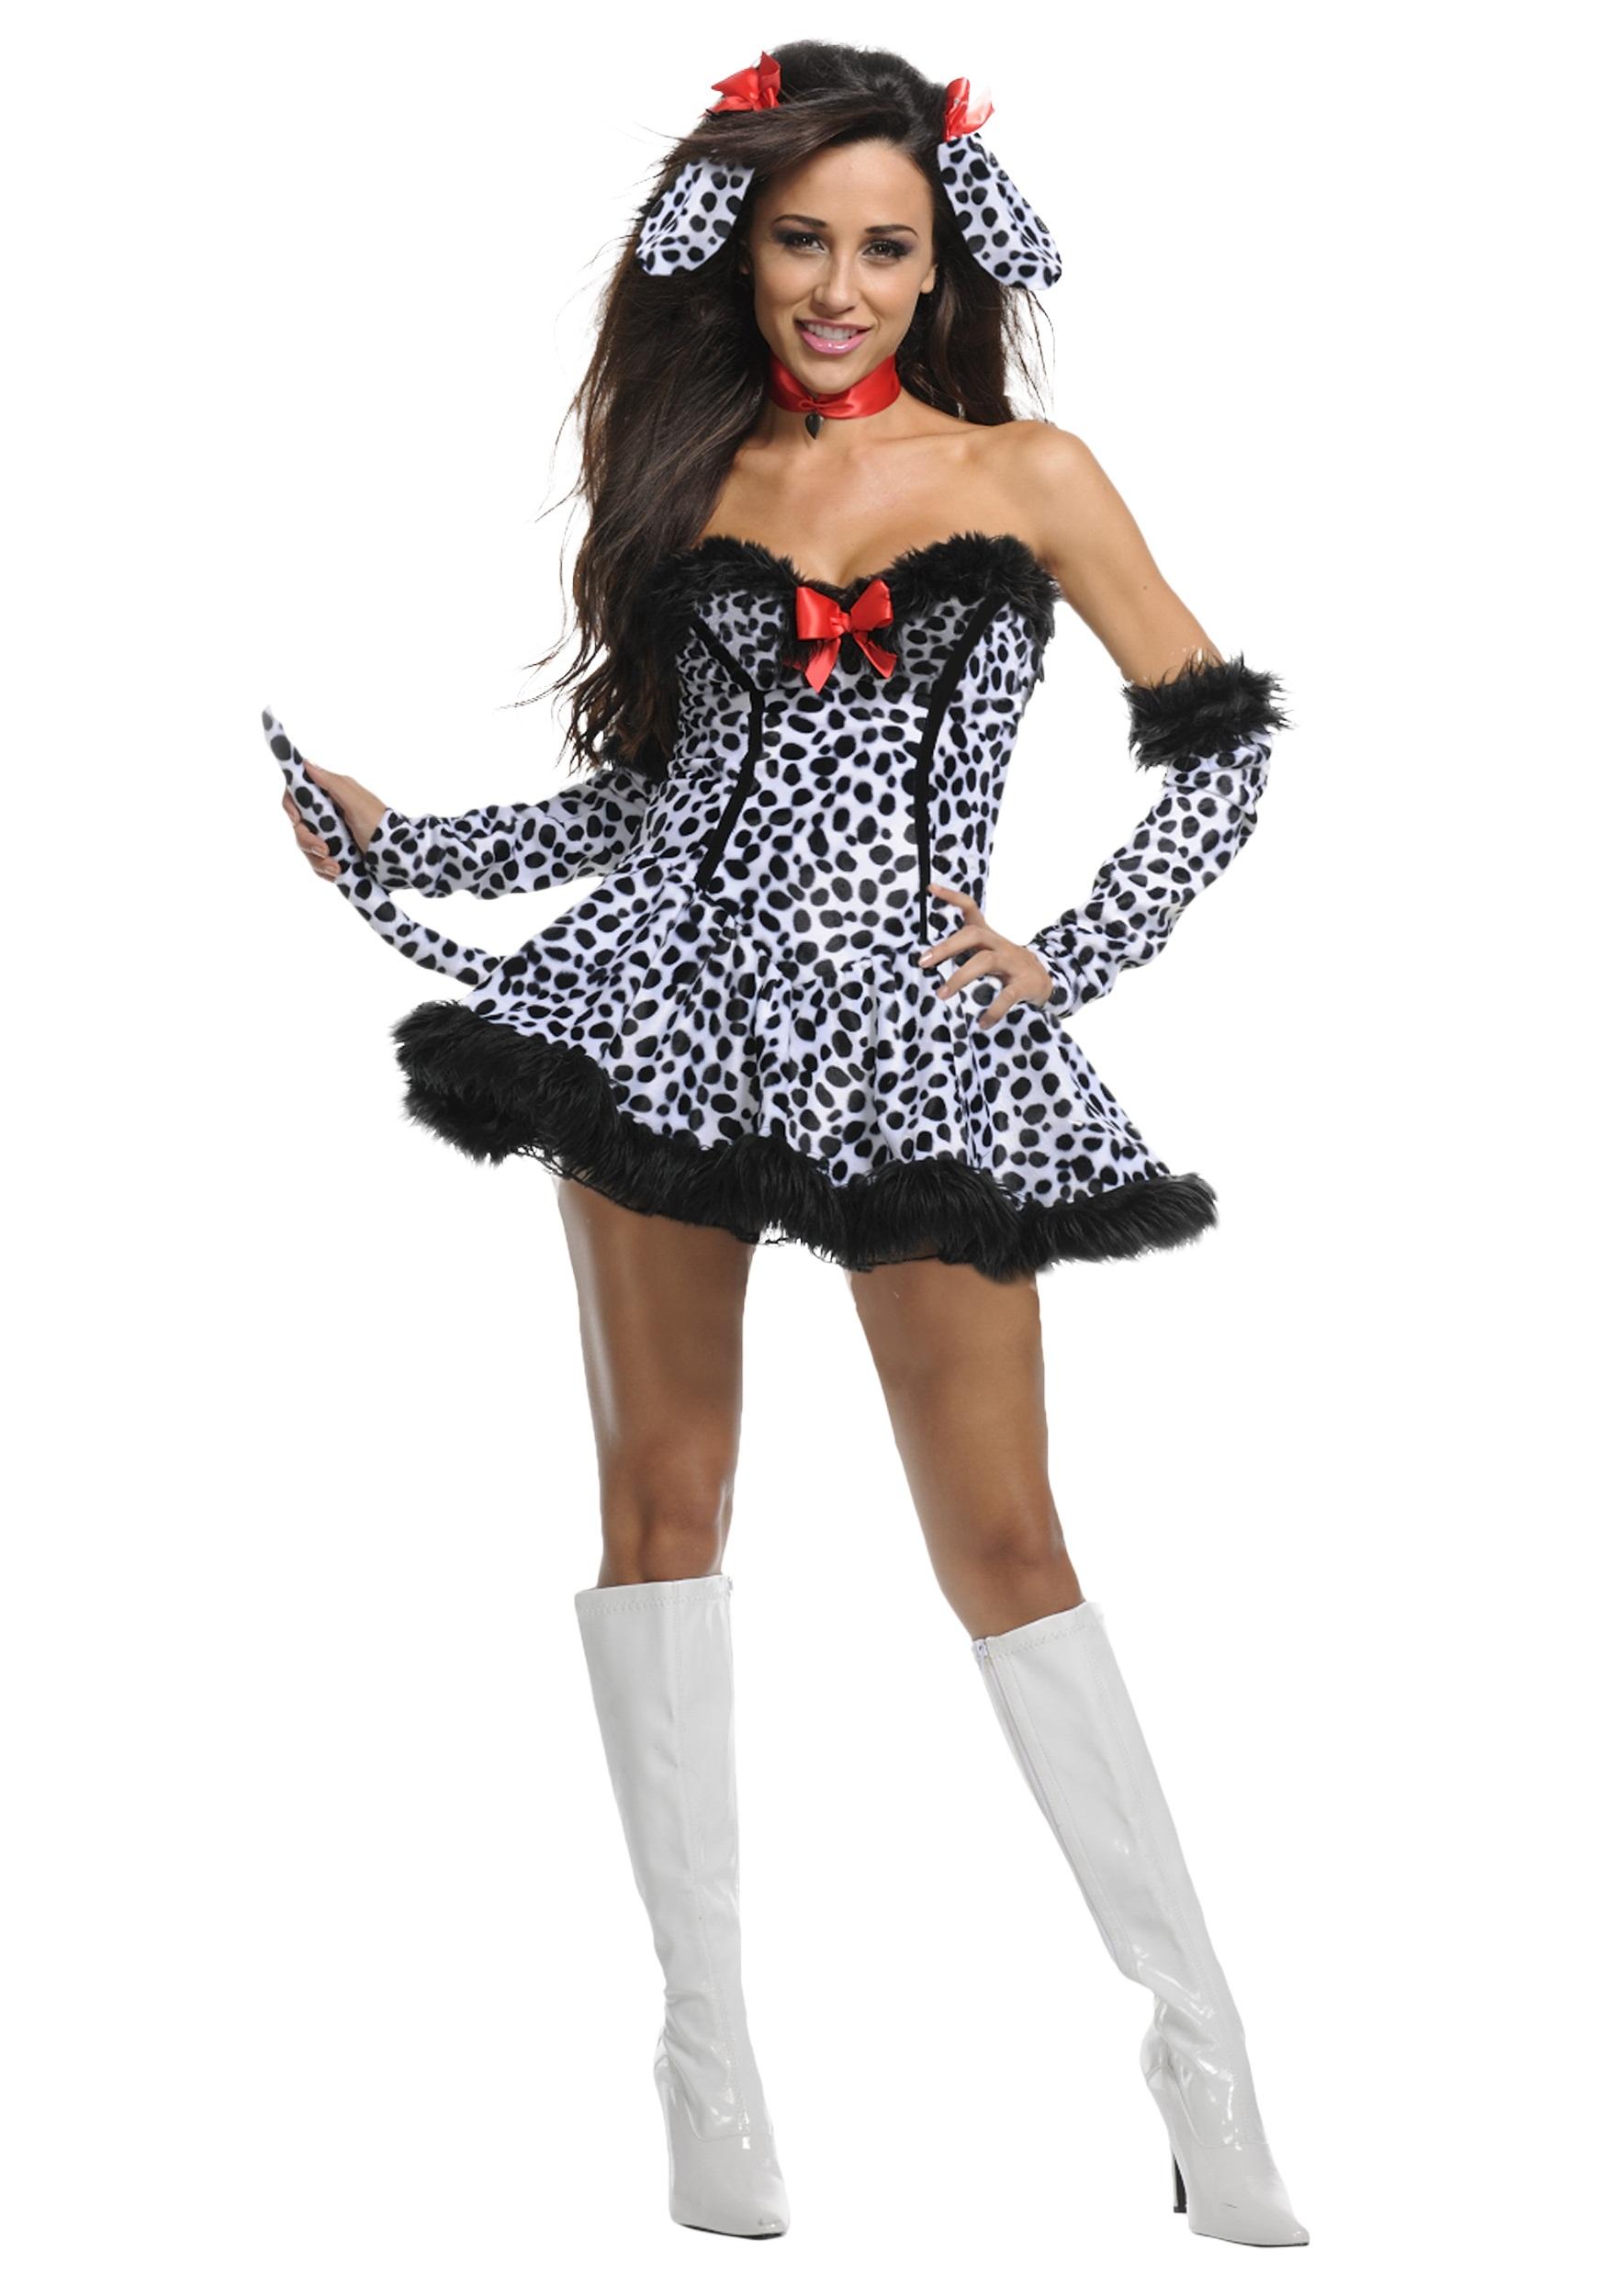 Exclusive Sexy Dalmatian Costume  sc 1 st  Halloween Costumes & Exclusive Sexy Dalmatian Costume - Halloween Costumes